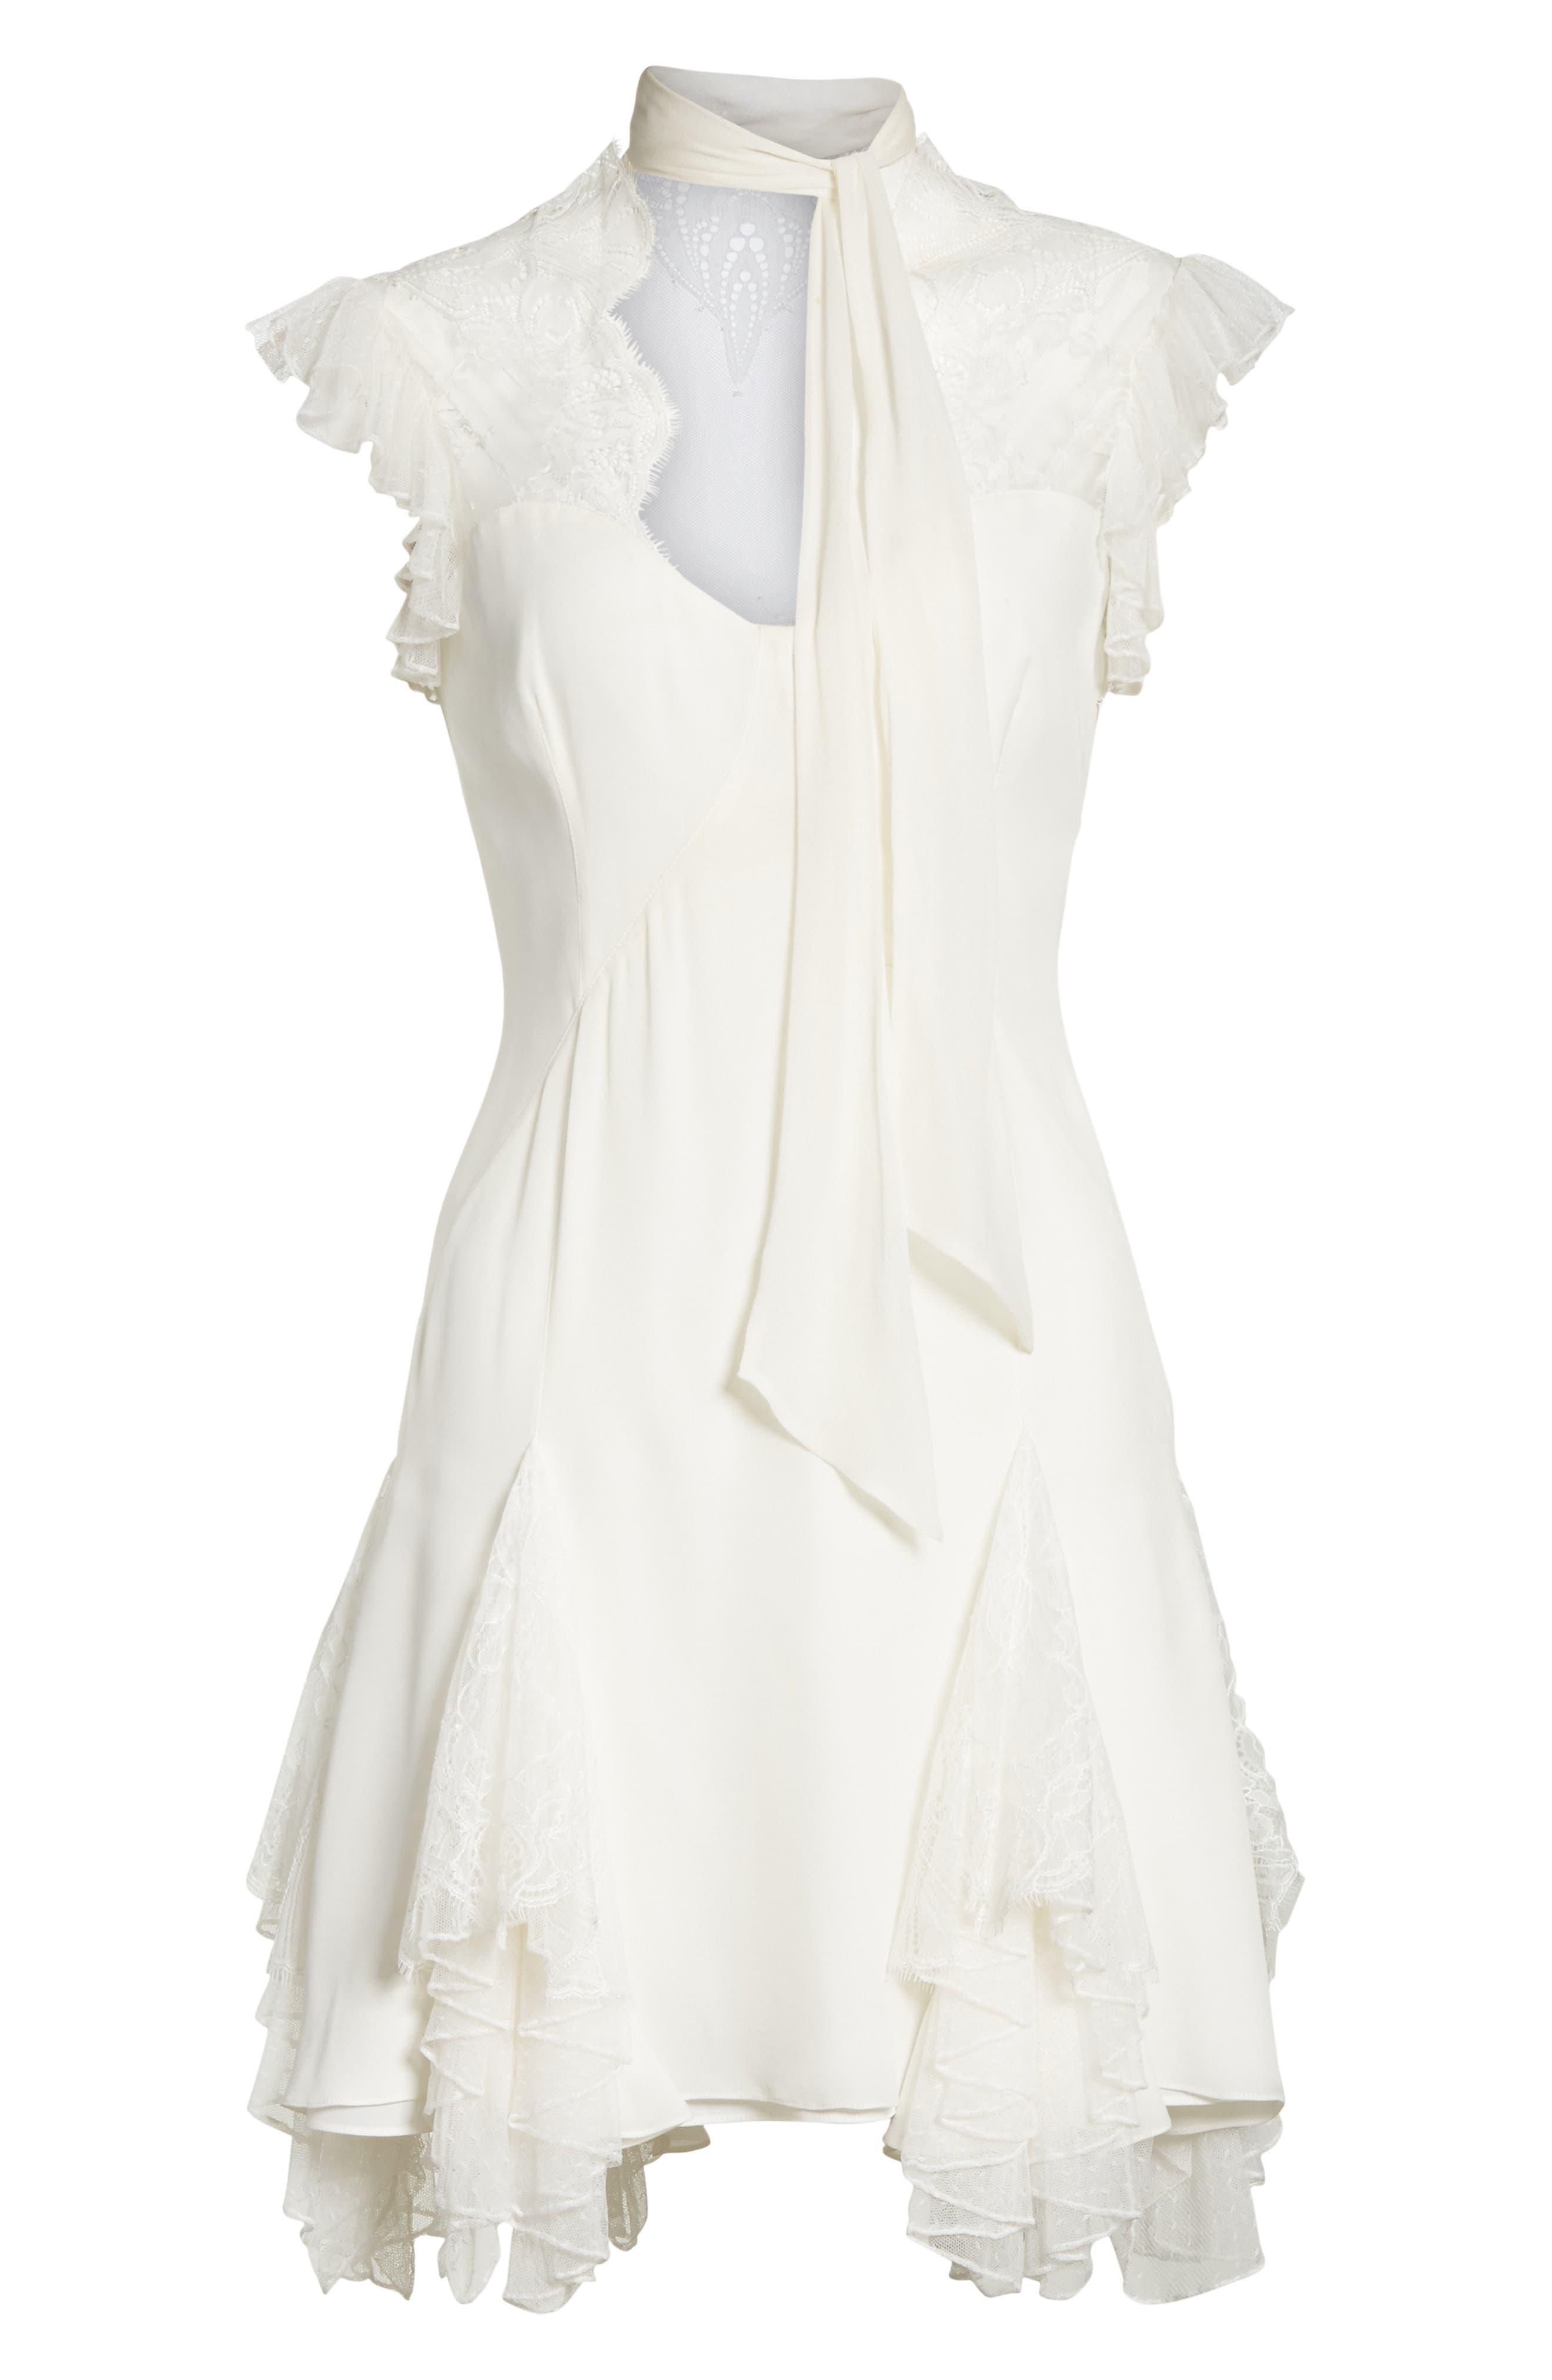 Clotilde Lace Trim Silk Dress with Scarf,                             Alternate thumbnail 6, color,                             902